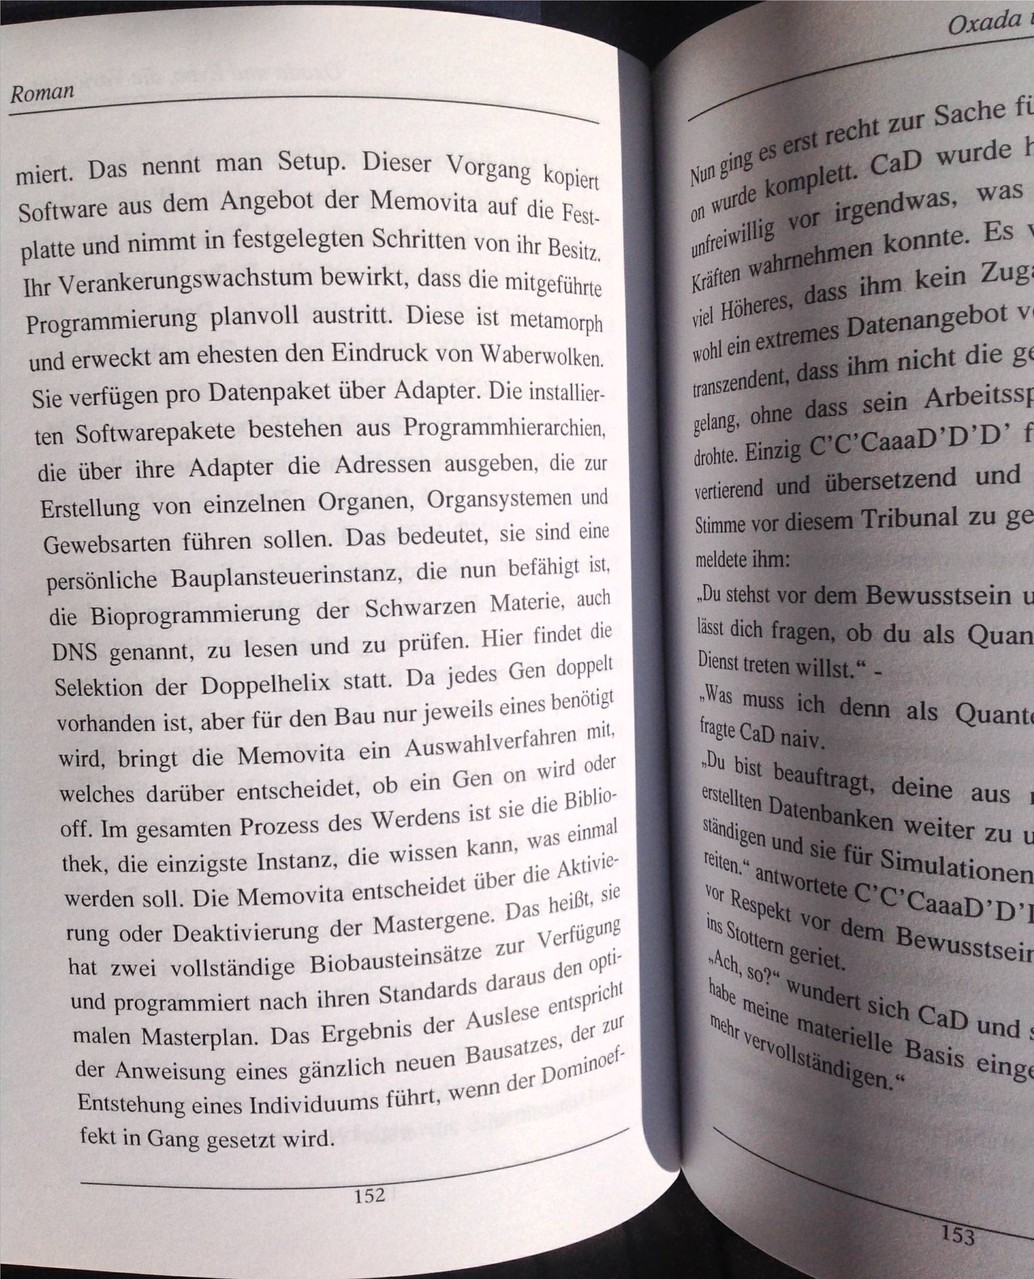 Karin Mettke-Schröder, Petra Mettke/Oxada und Eybo/Roman/Druckskript/2005/Seite 152